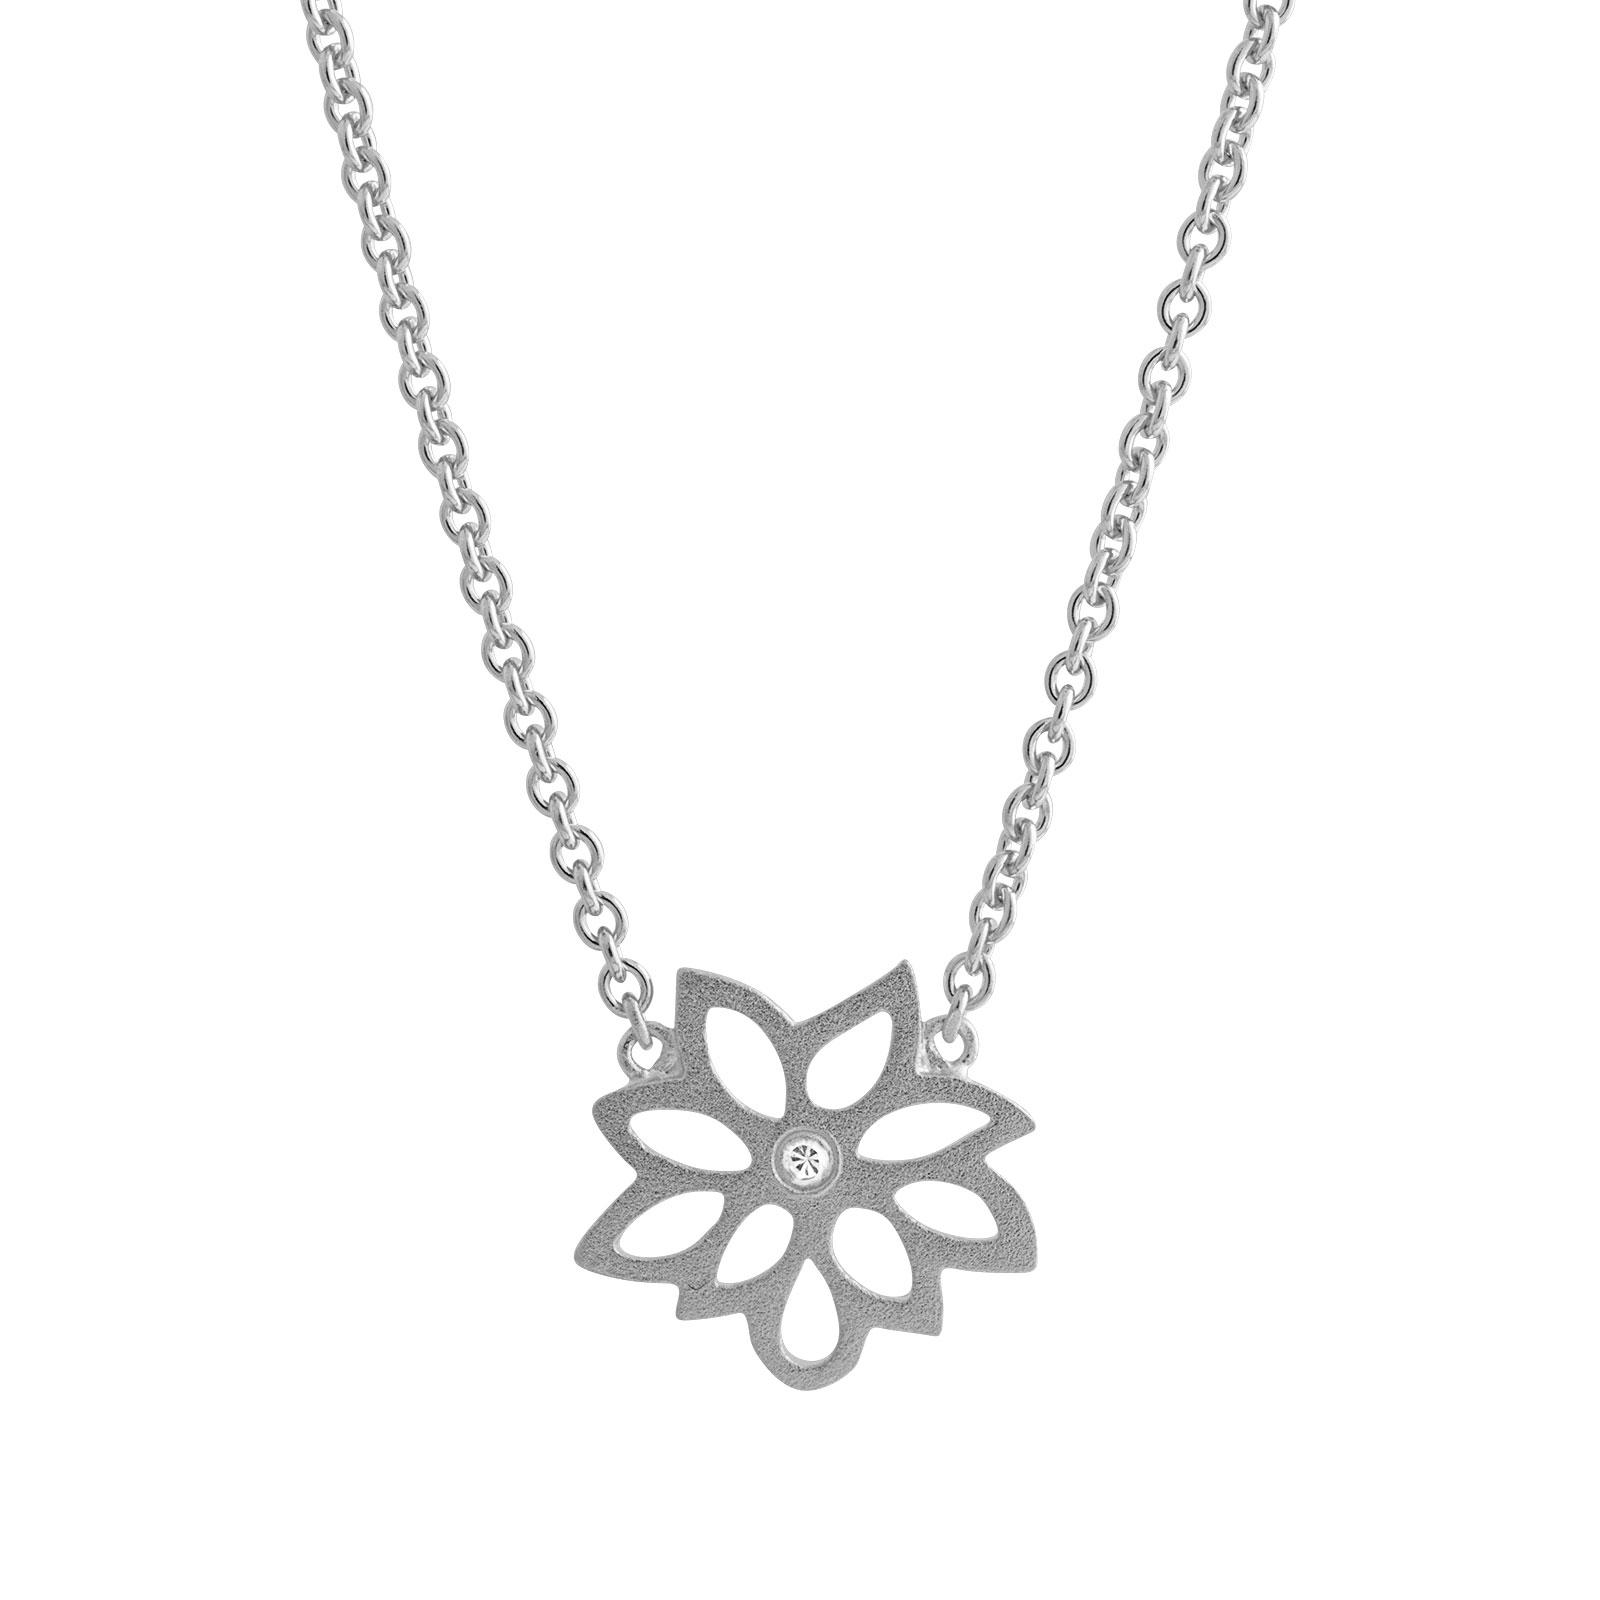 Dahlia Sølv Halskæde fra Lene Visholm N.1269RH